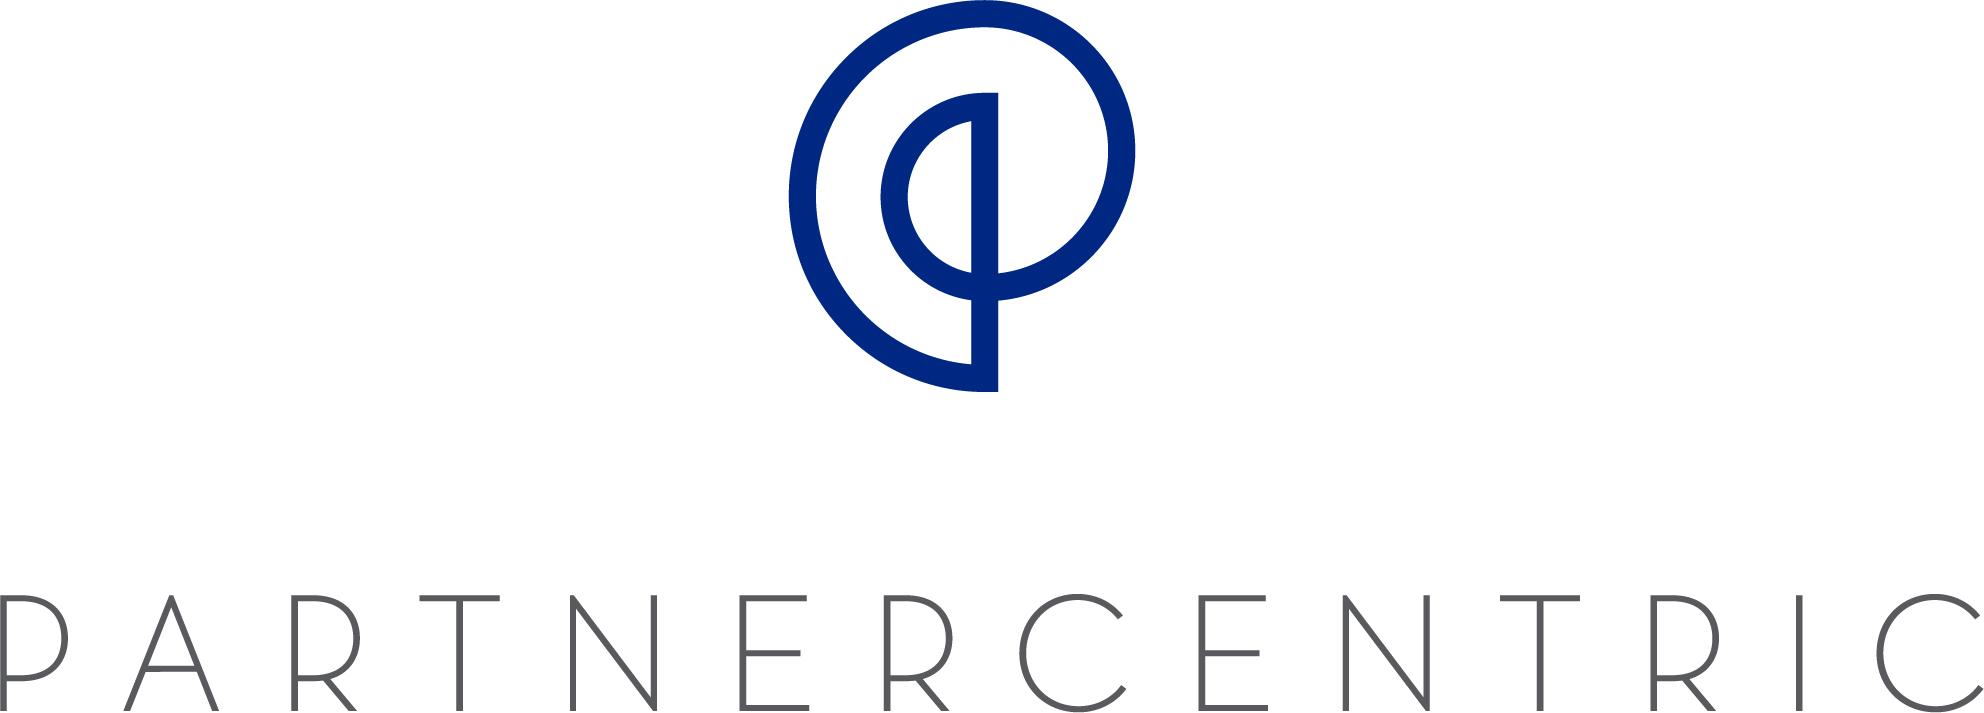 PartnerCentric, Inc.